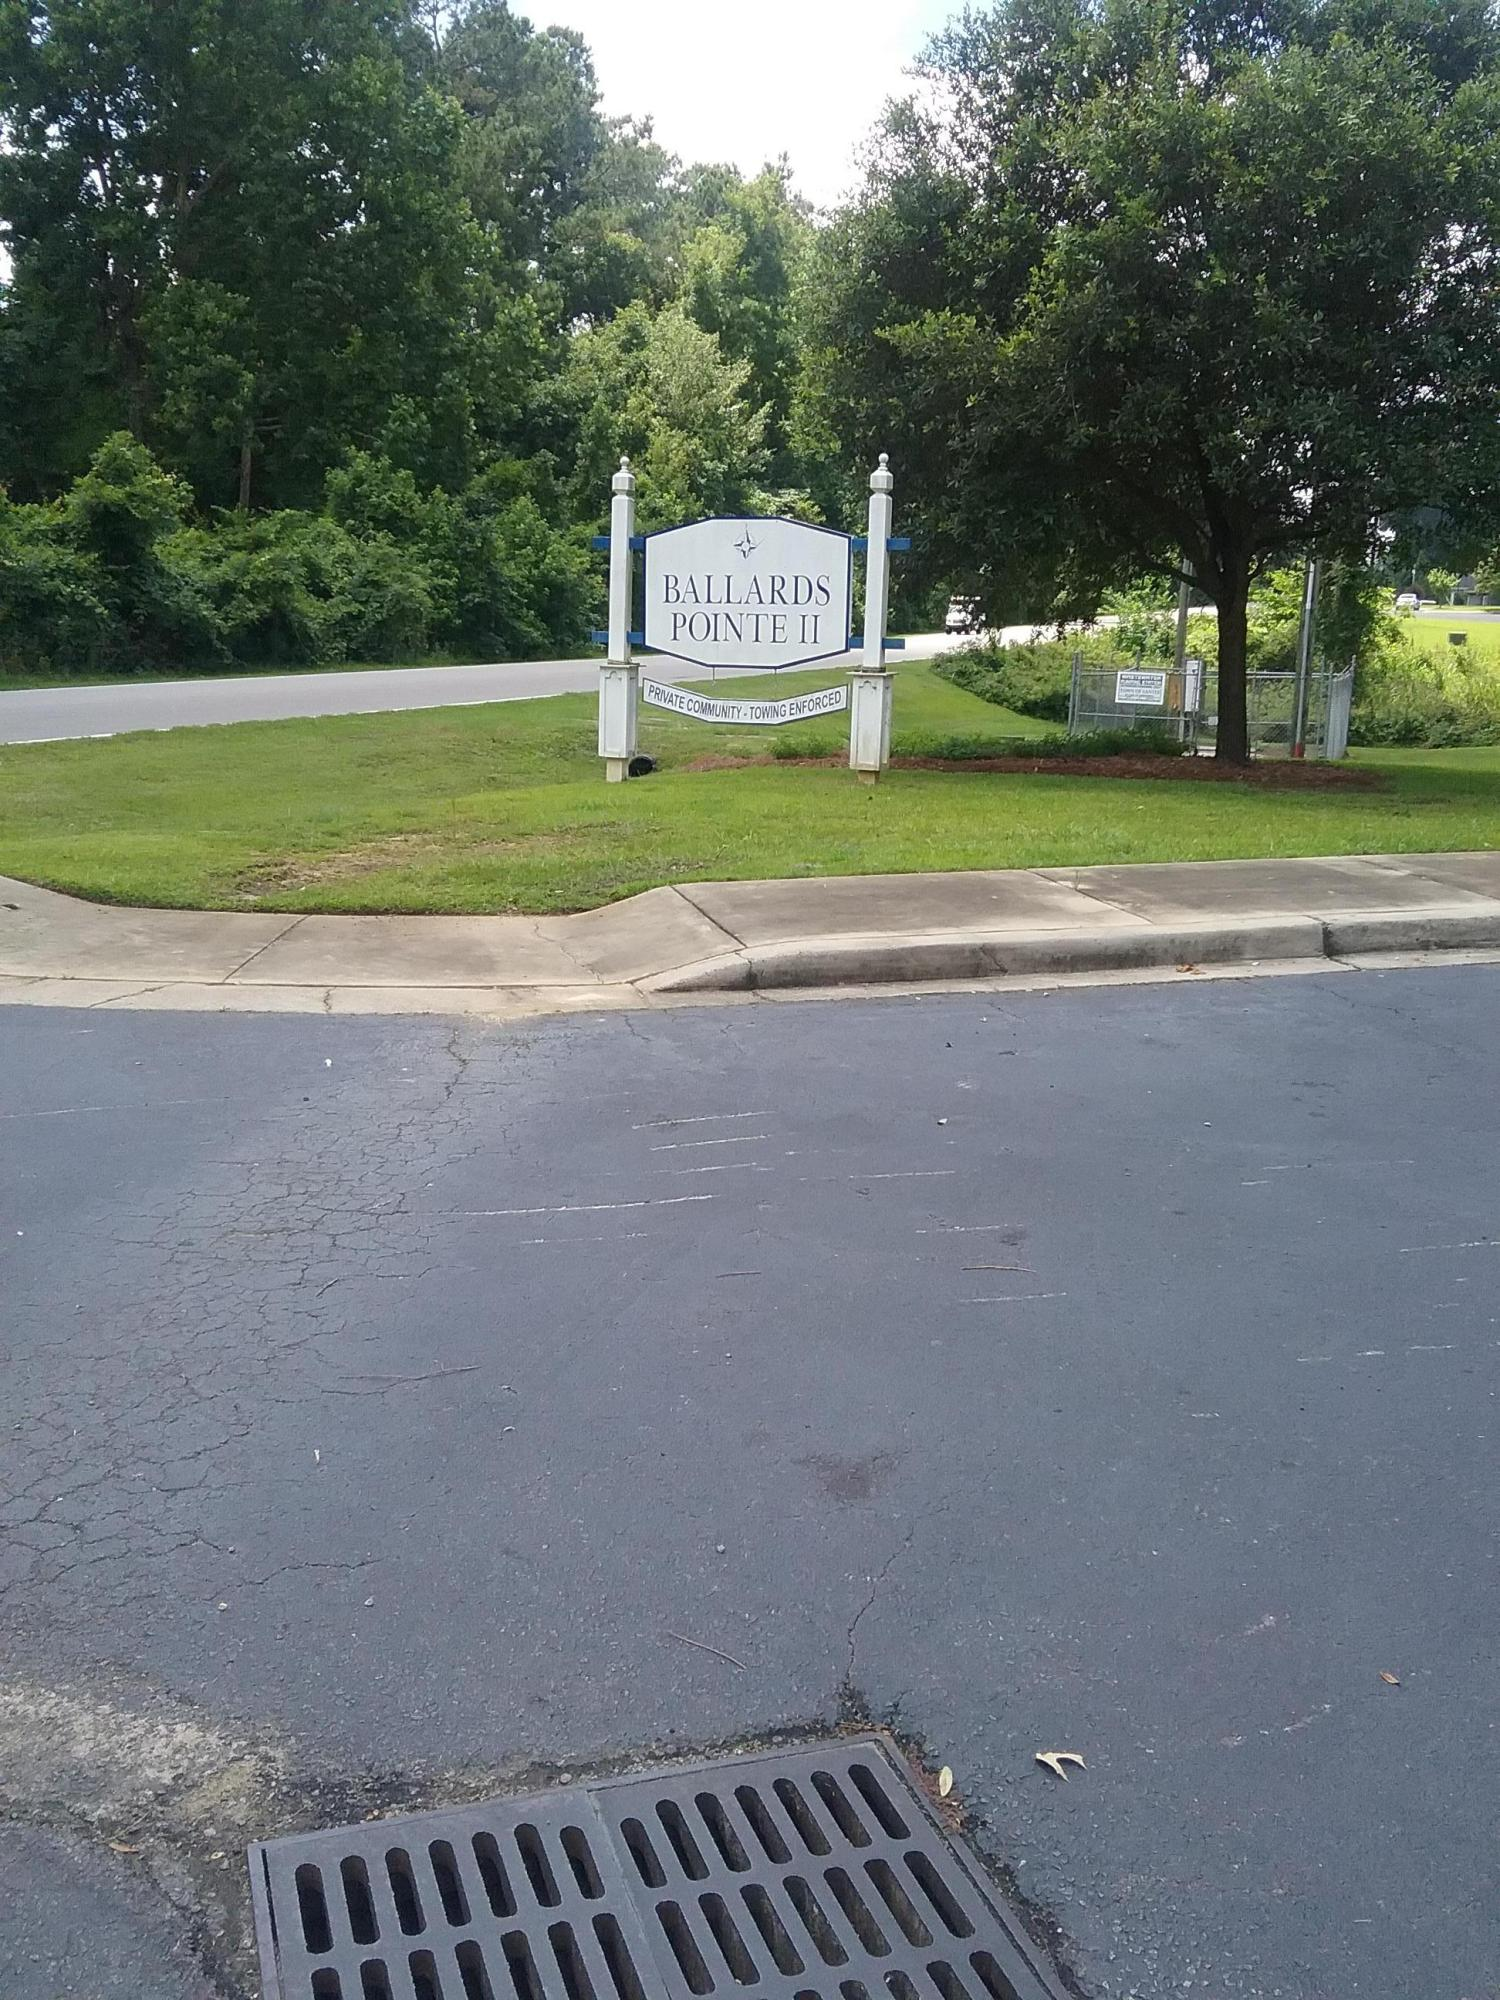 Ballards Pointe II Homes For Sale - 103 Ballard, Santee, SC - 36